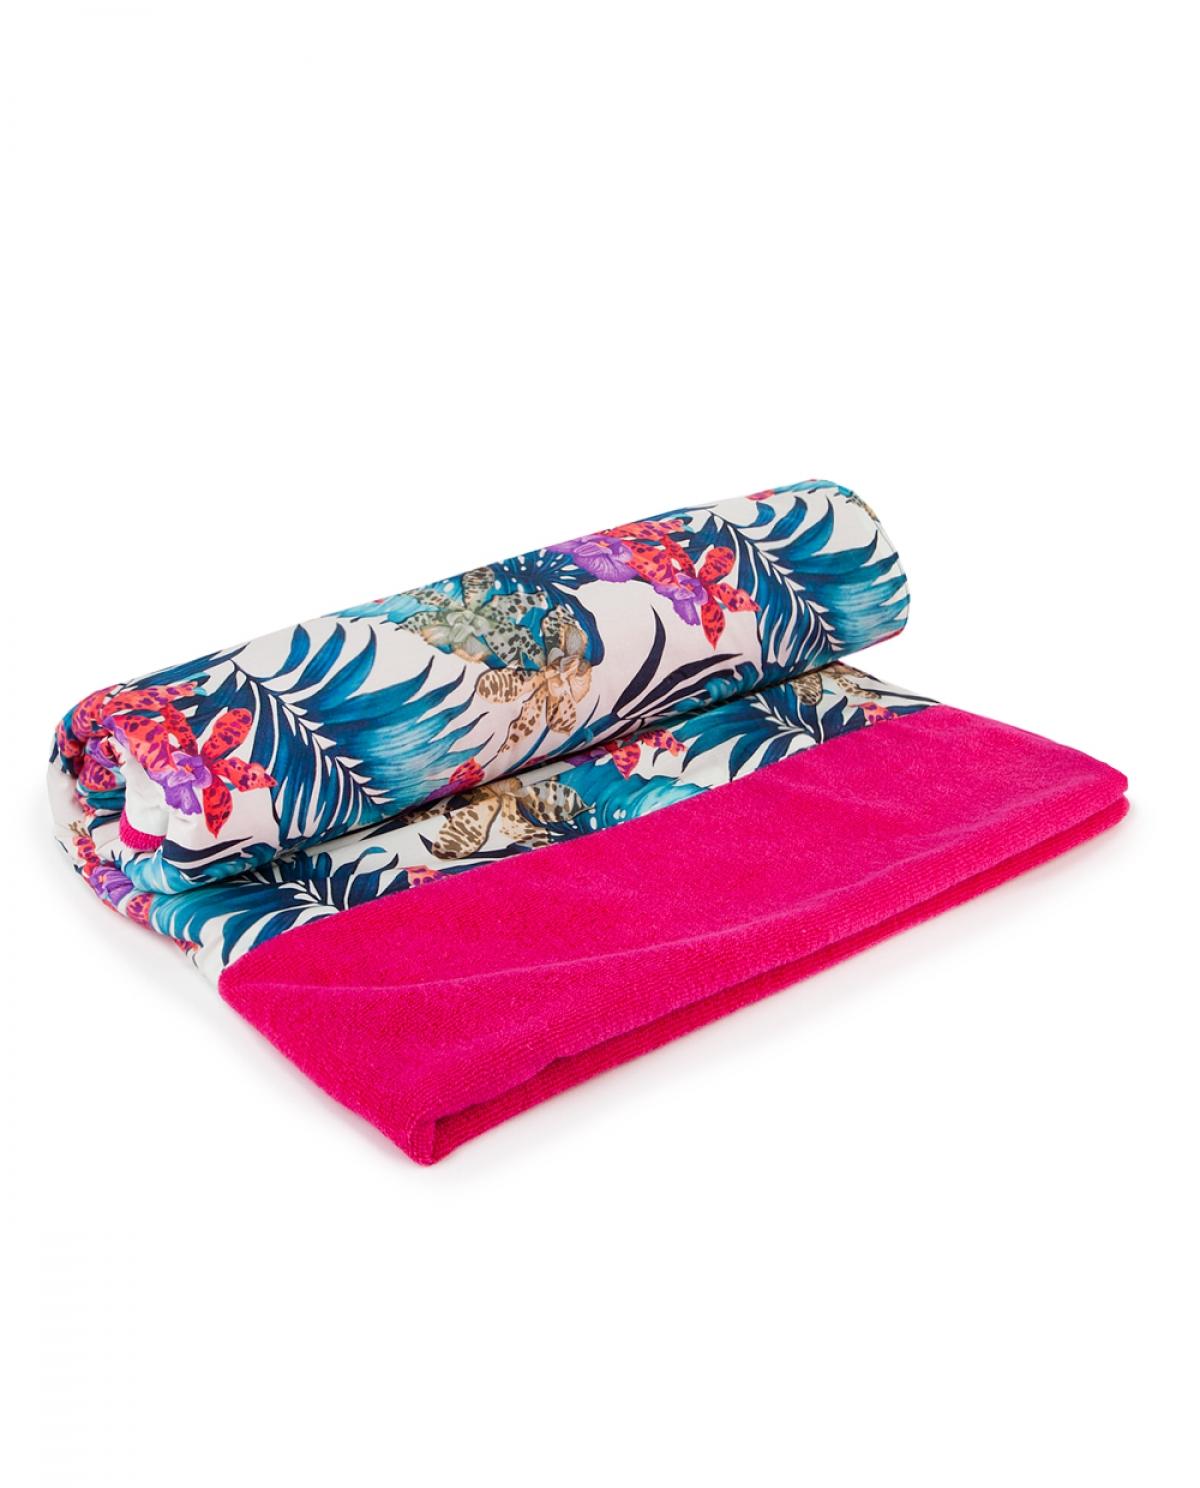 Exotica Magenta Beach Towel